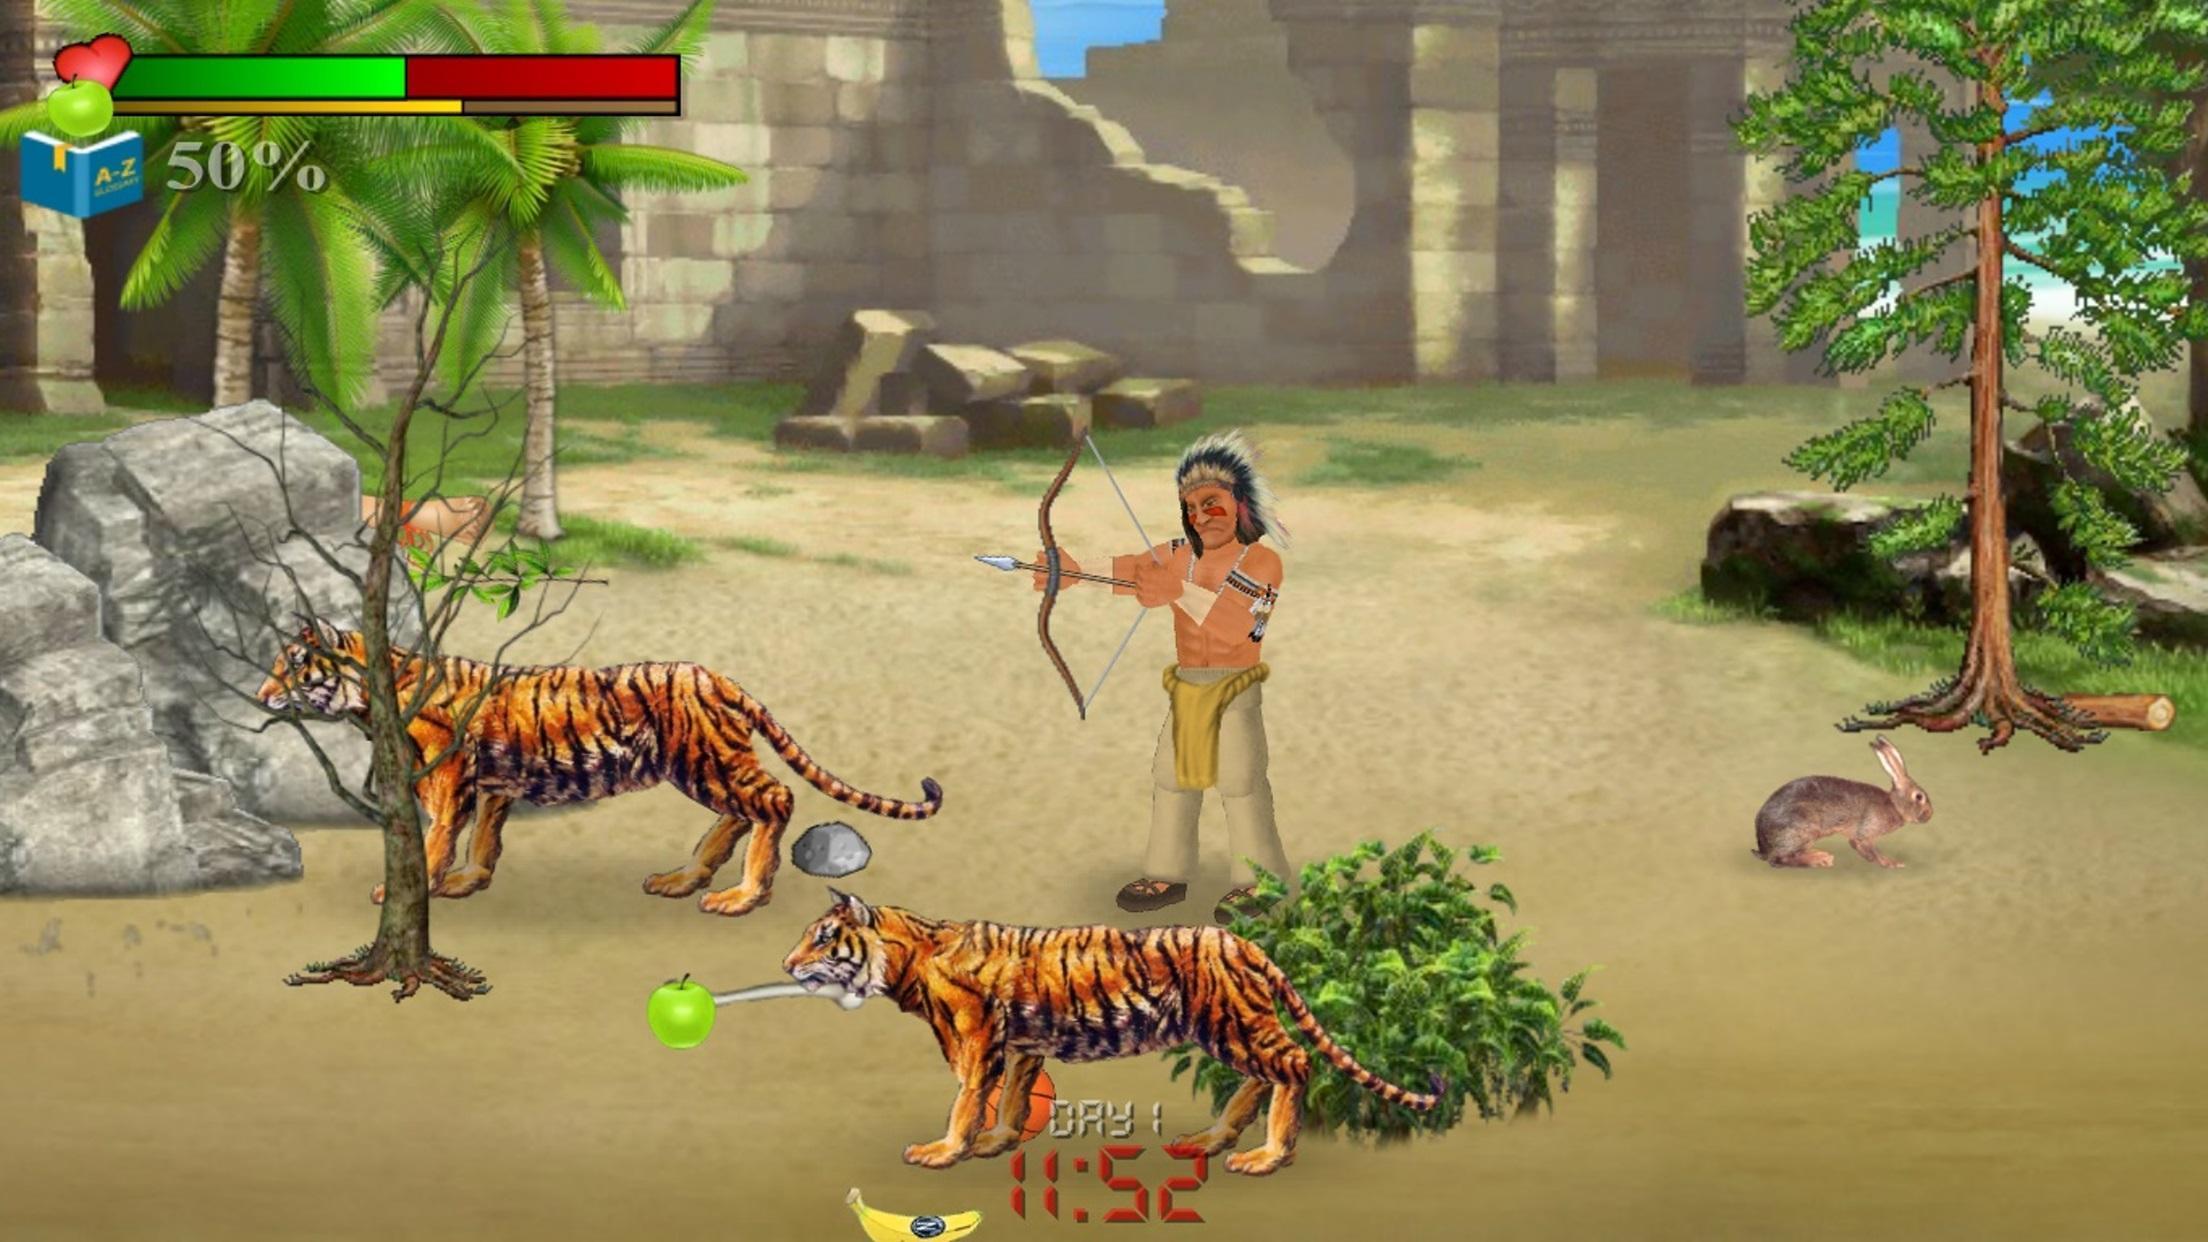 Wrecked (Island Survival Sim) 1.144 Screenshot 5